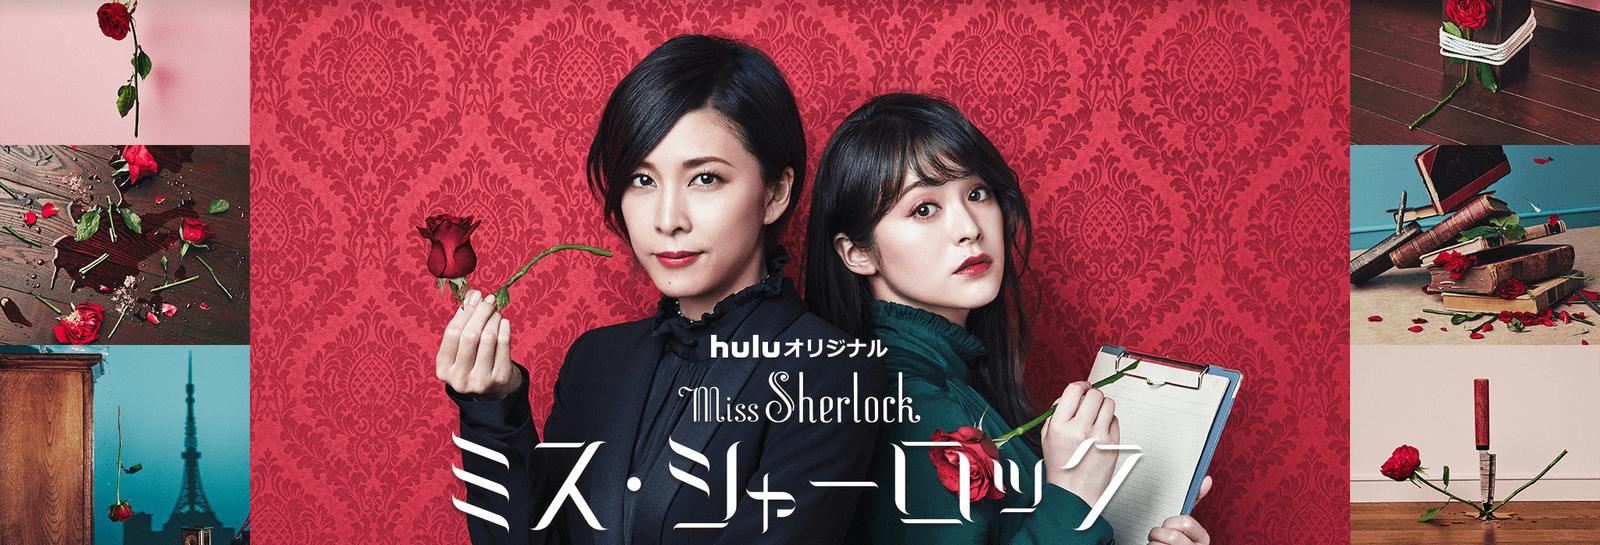 【Huluおすすめ国内ドラマ】Hulu(フールー)のおすすめ国内ドラマ作品一覧|3年a組・あなたの番ですなどの日テレ系ドラマやオリジナルドラマも充実!|Huluオリジナルドラマ:ミス・シャーロック/Miss Sherlock